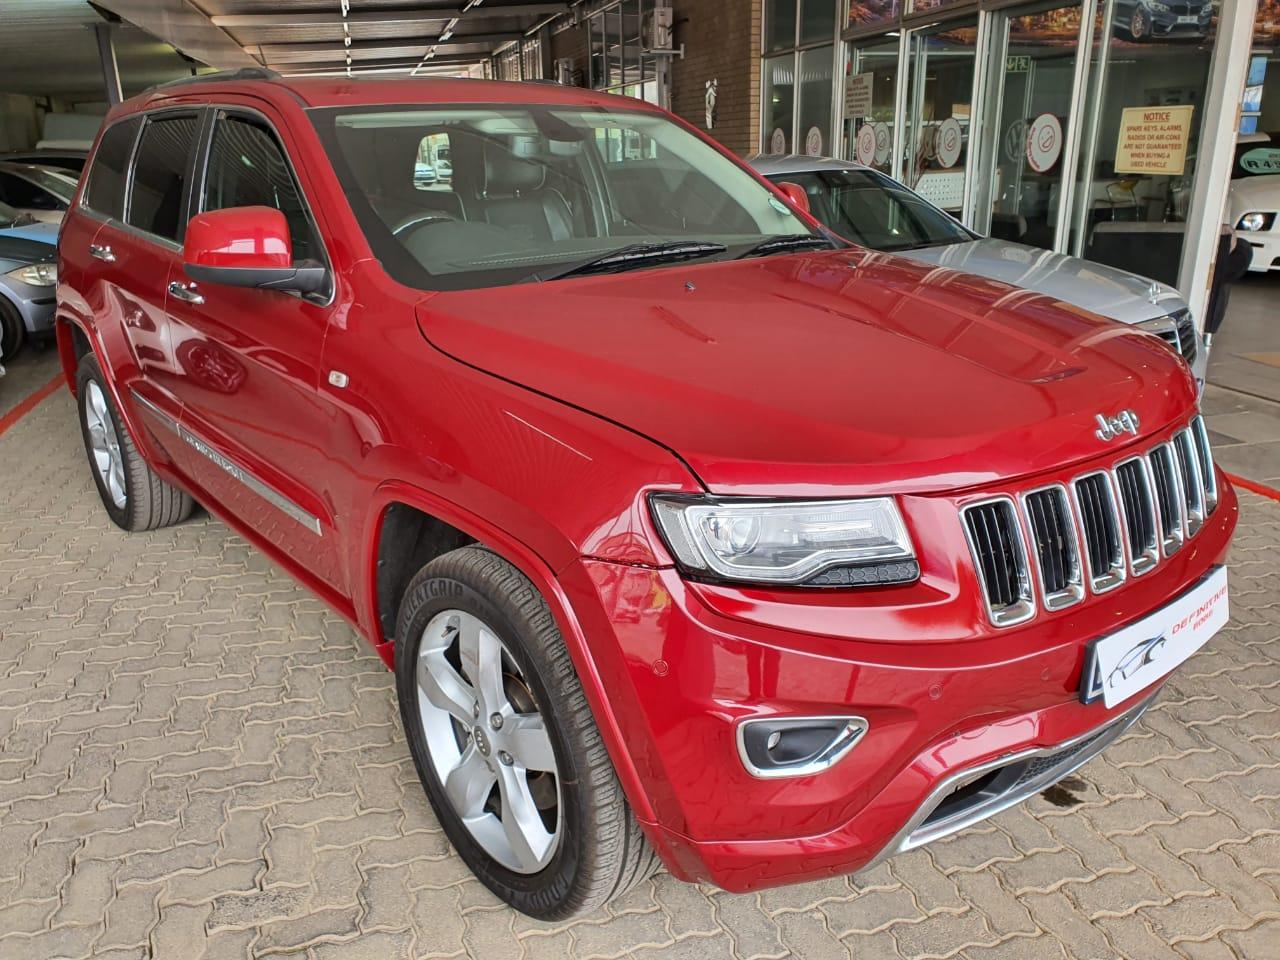 2012 Jeep Grand Cherokee 3.6L Overland